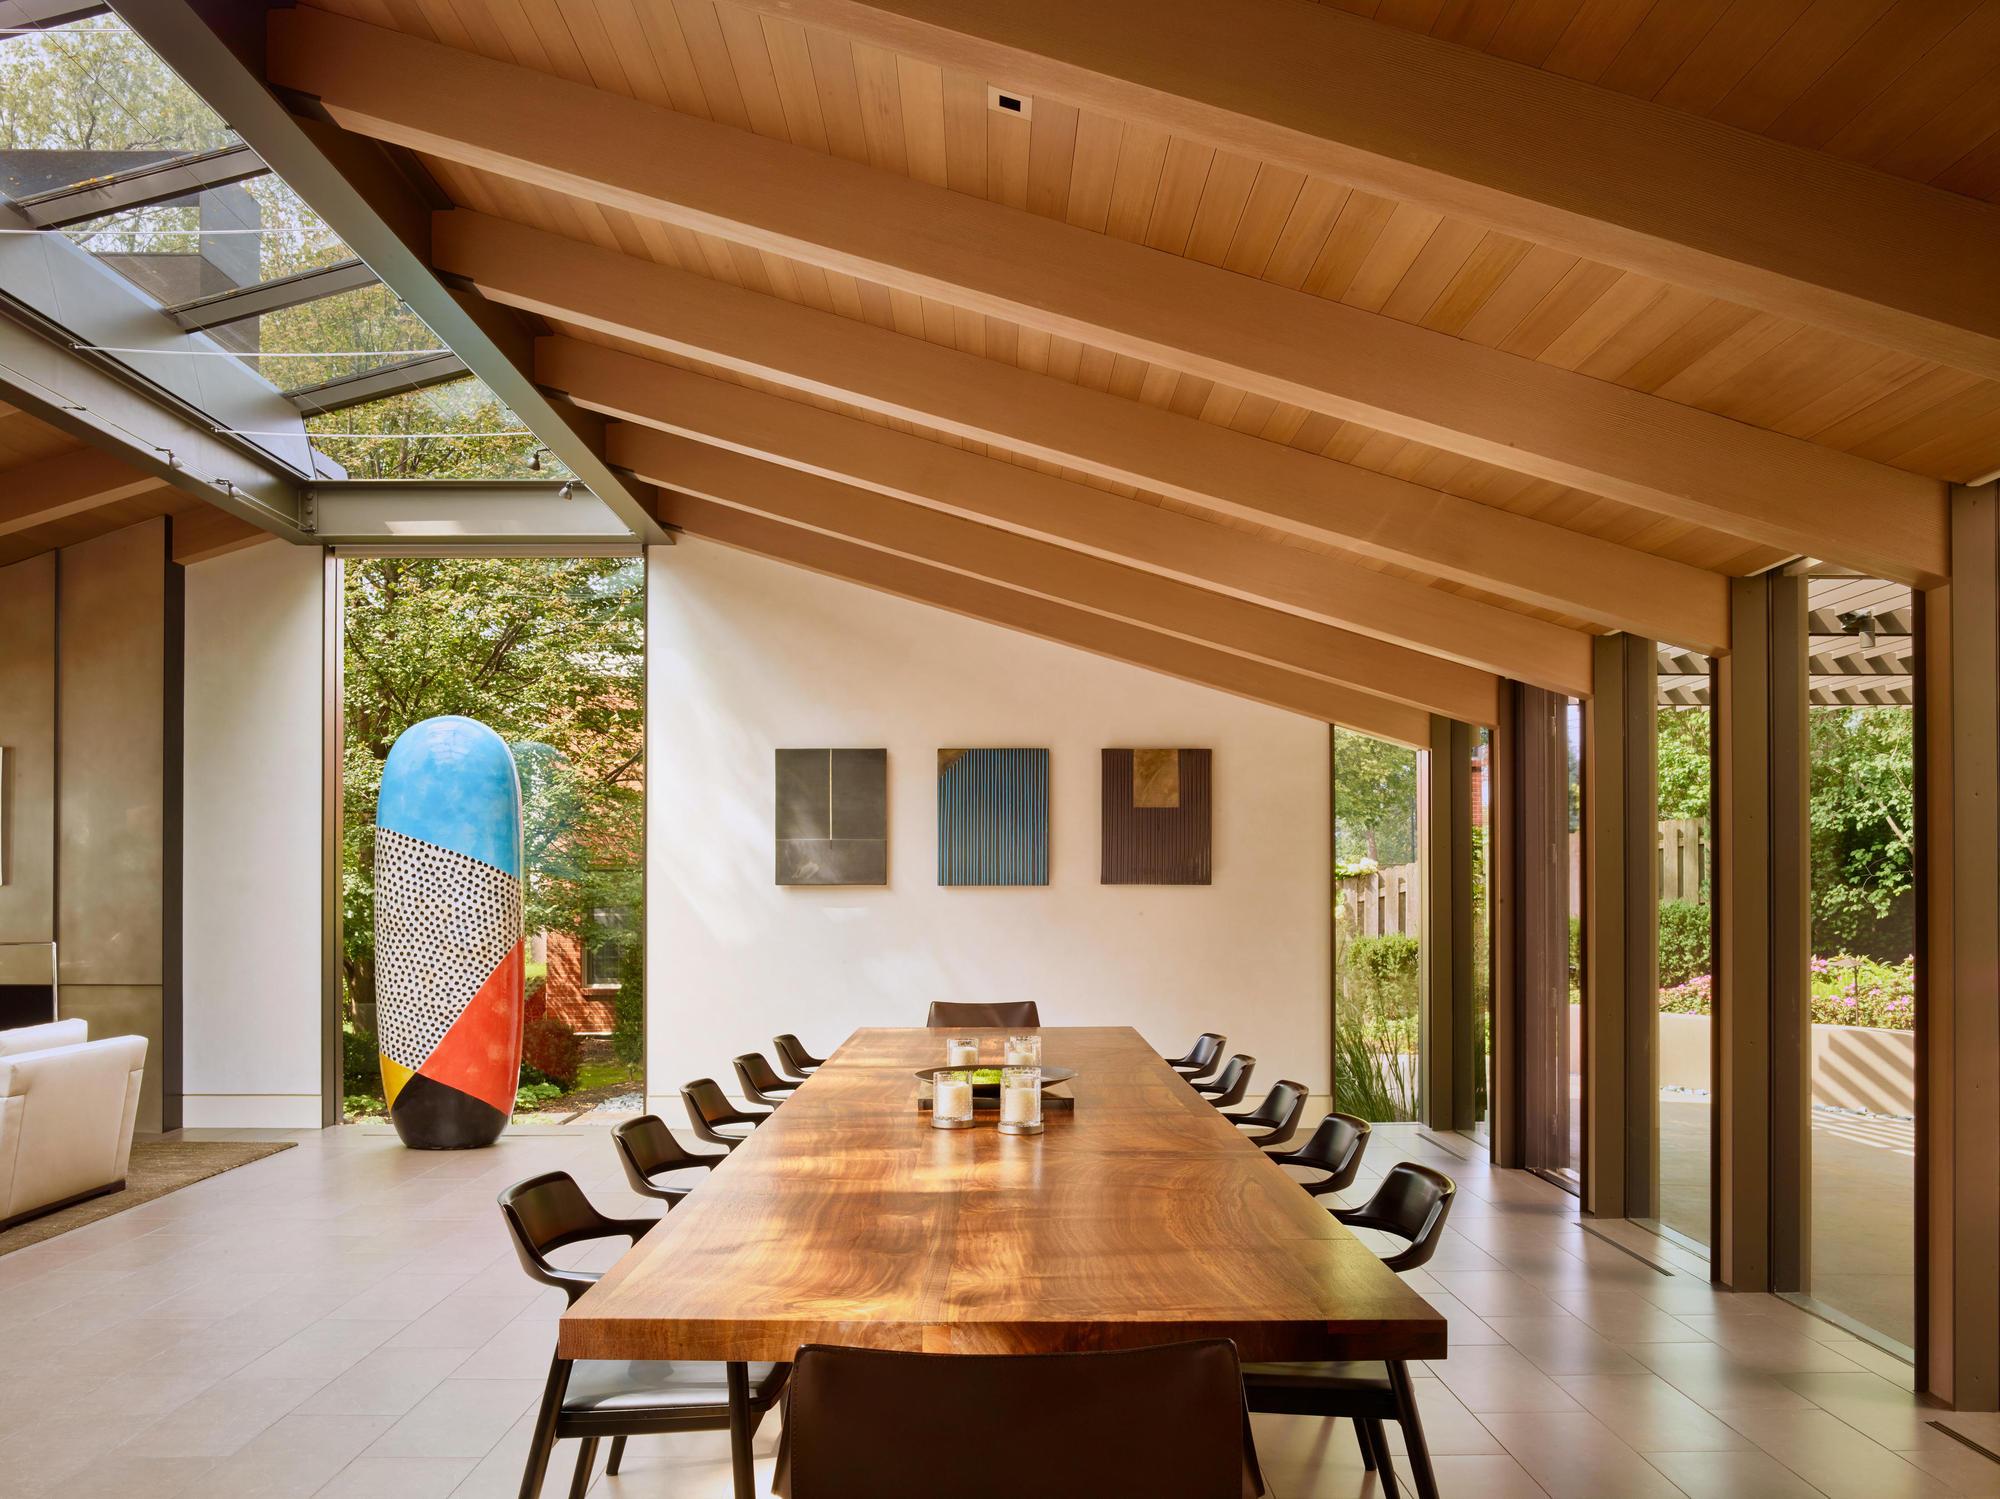 Omaha Art House / Olson Kundig